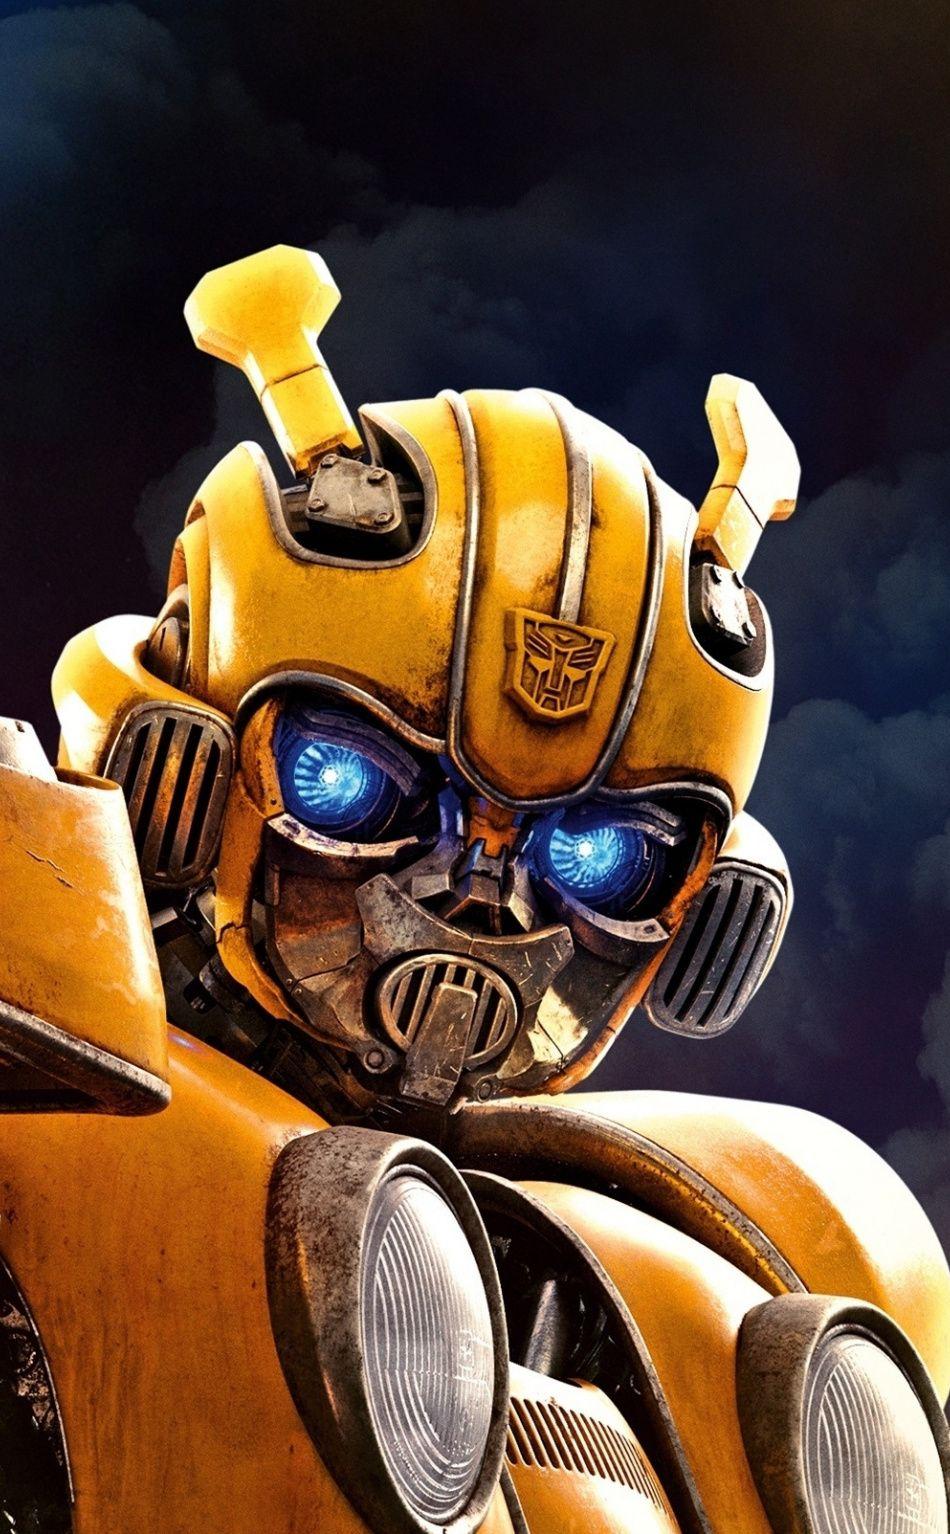 Bumblebee Transformers 2018 Movie 950x1534 Wallpaper Transformers Drawing Transformers Cars Transformers